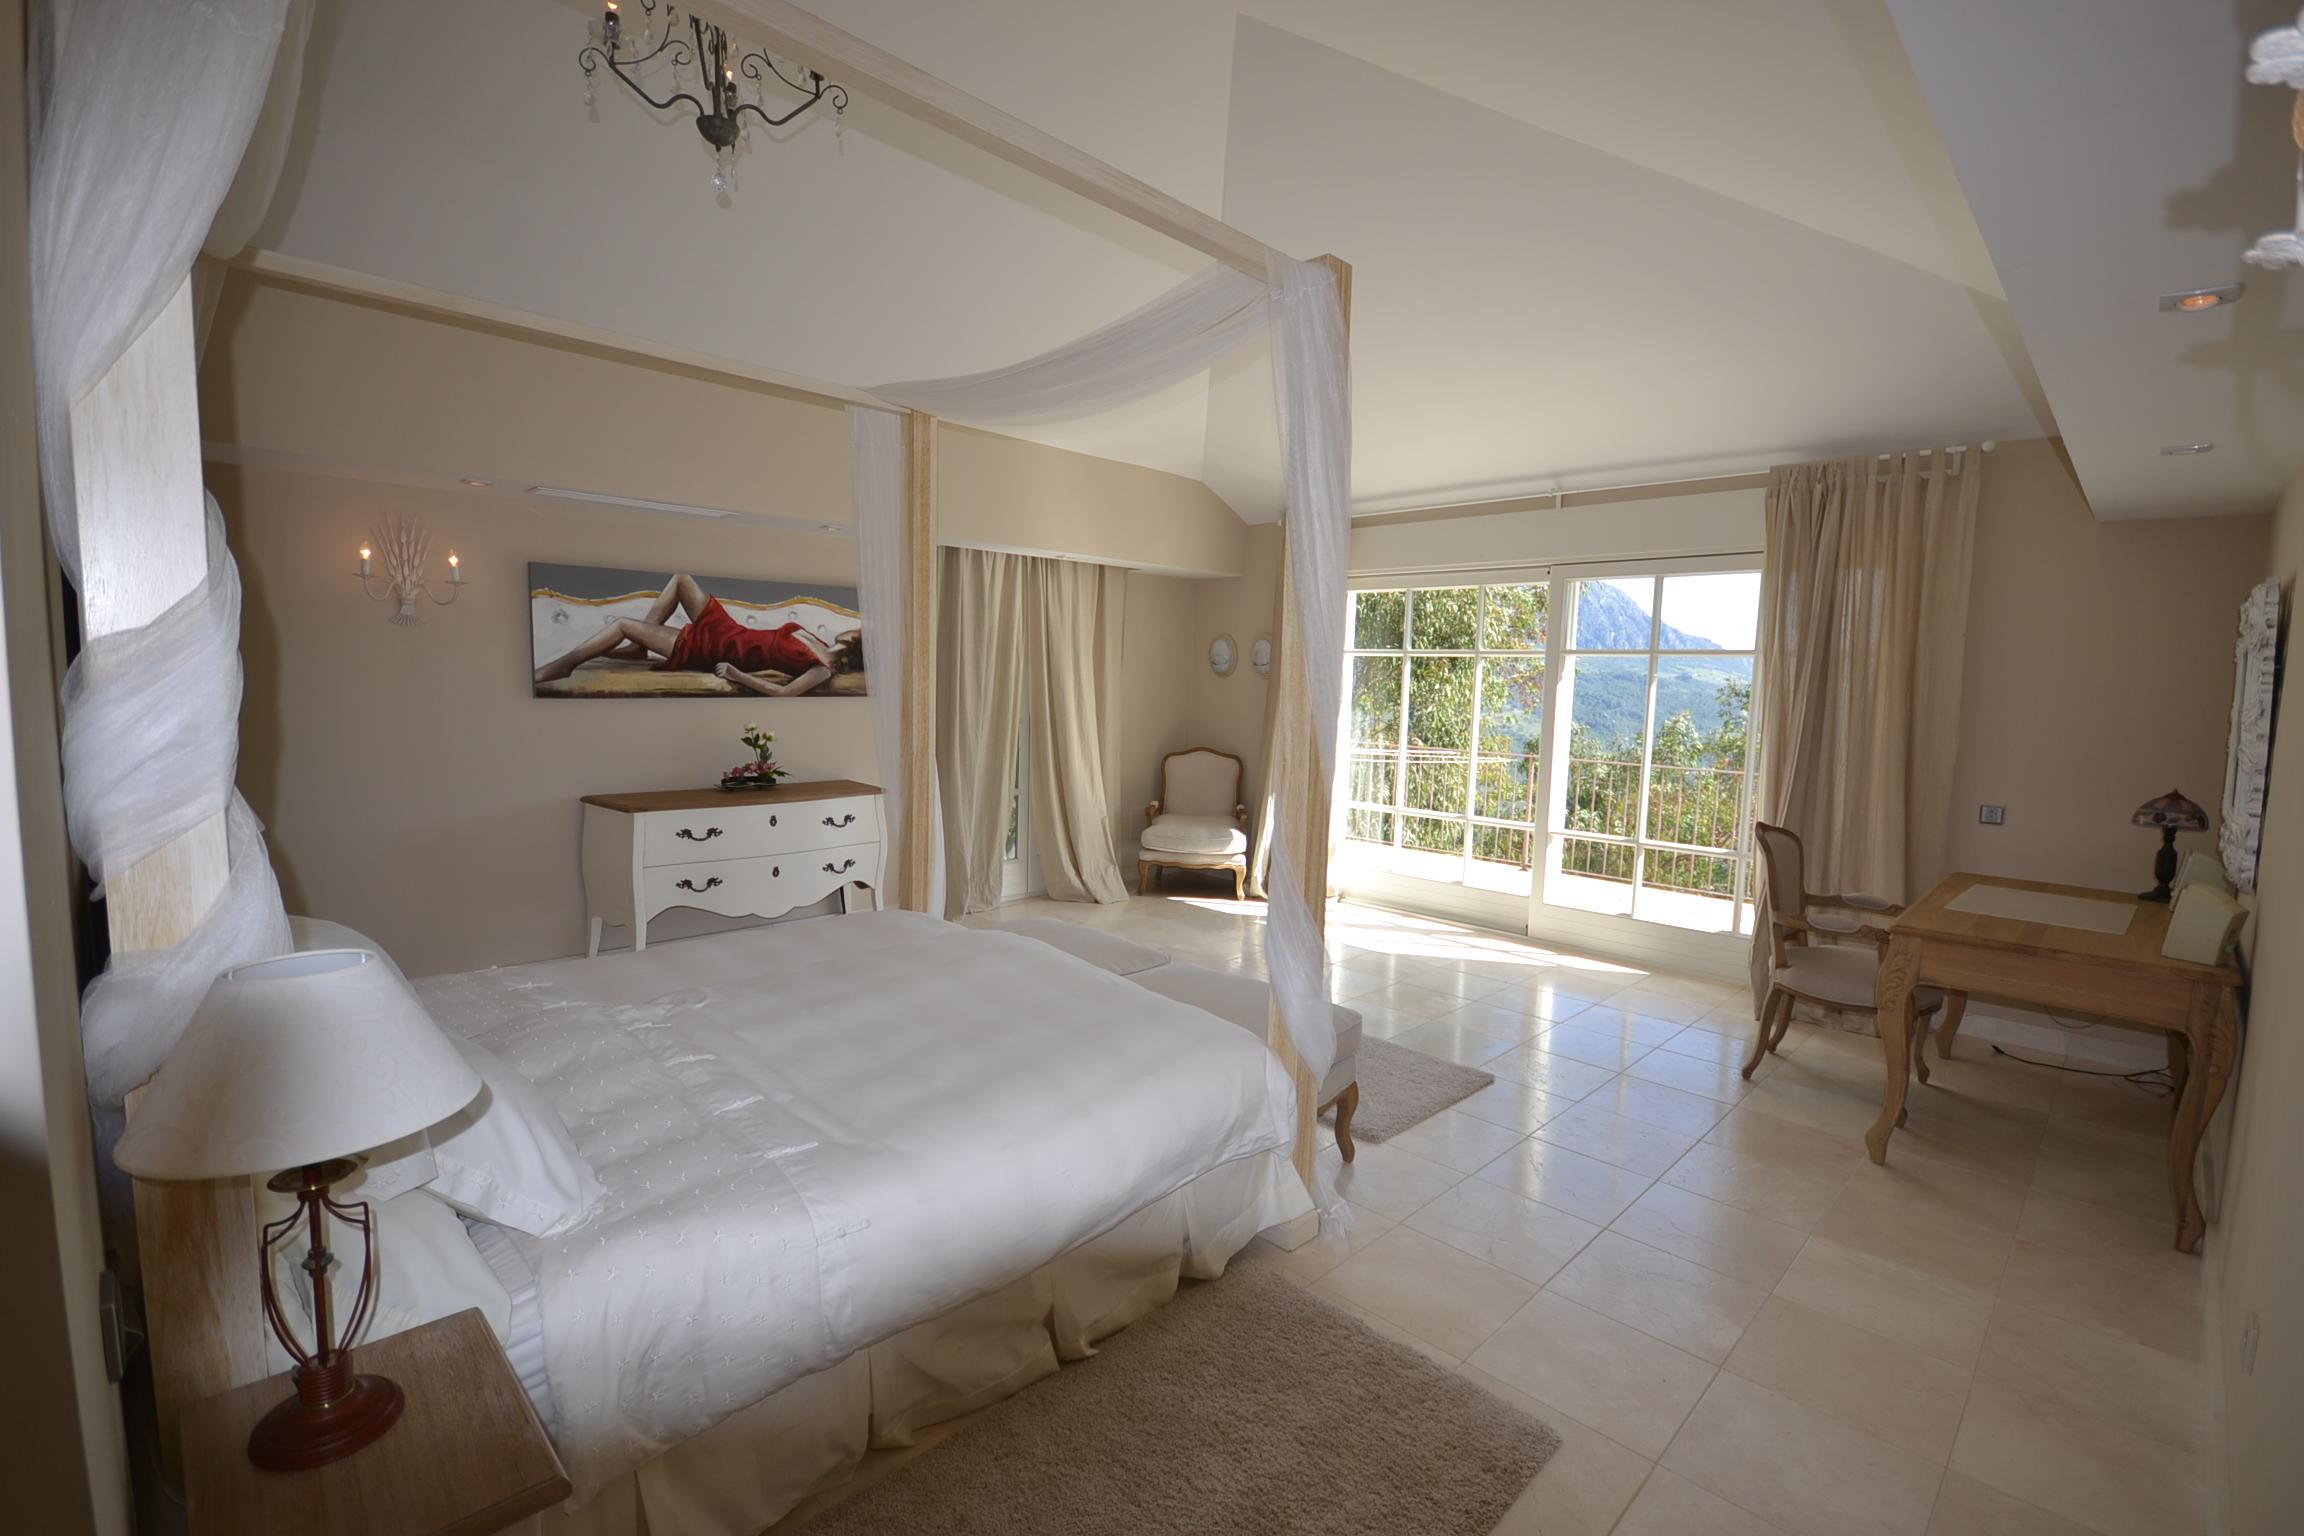 the master bedroom laposadaromana